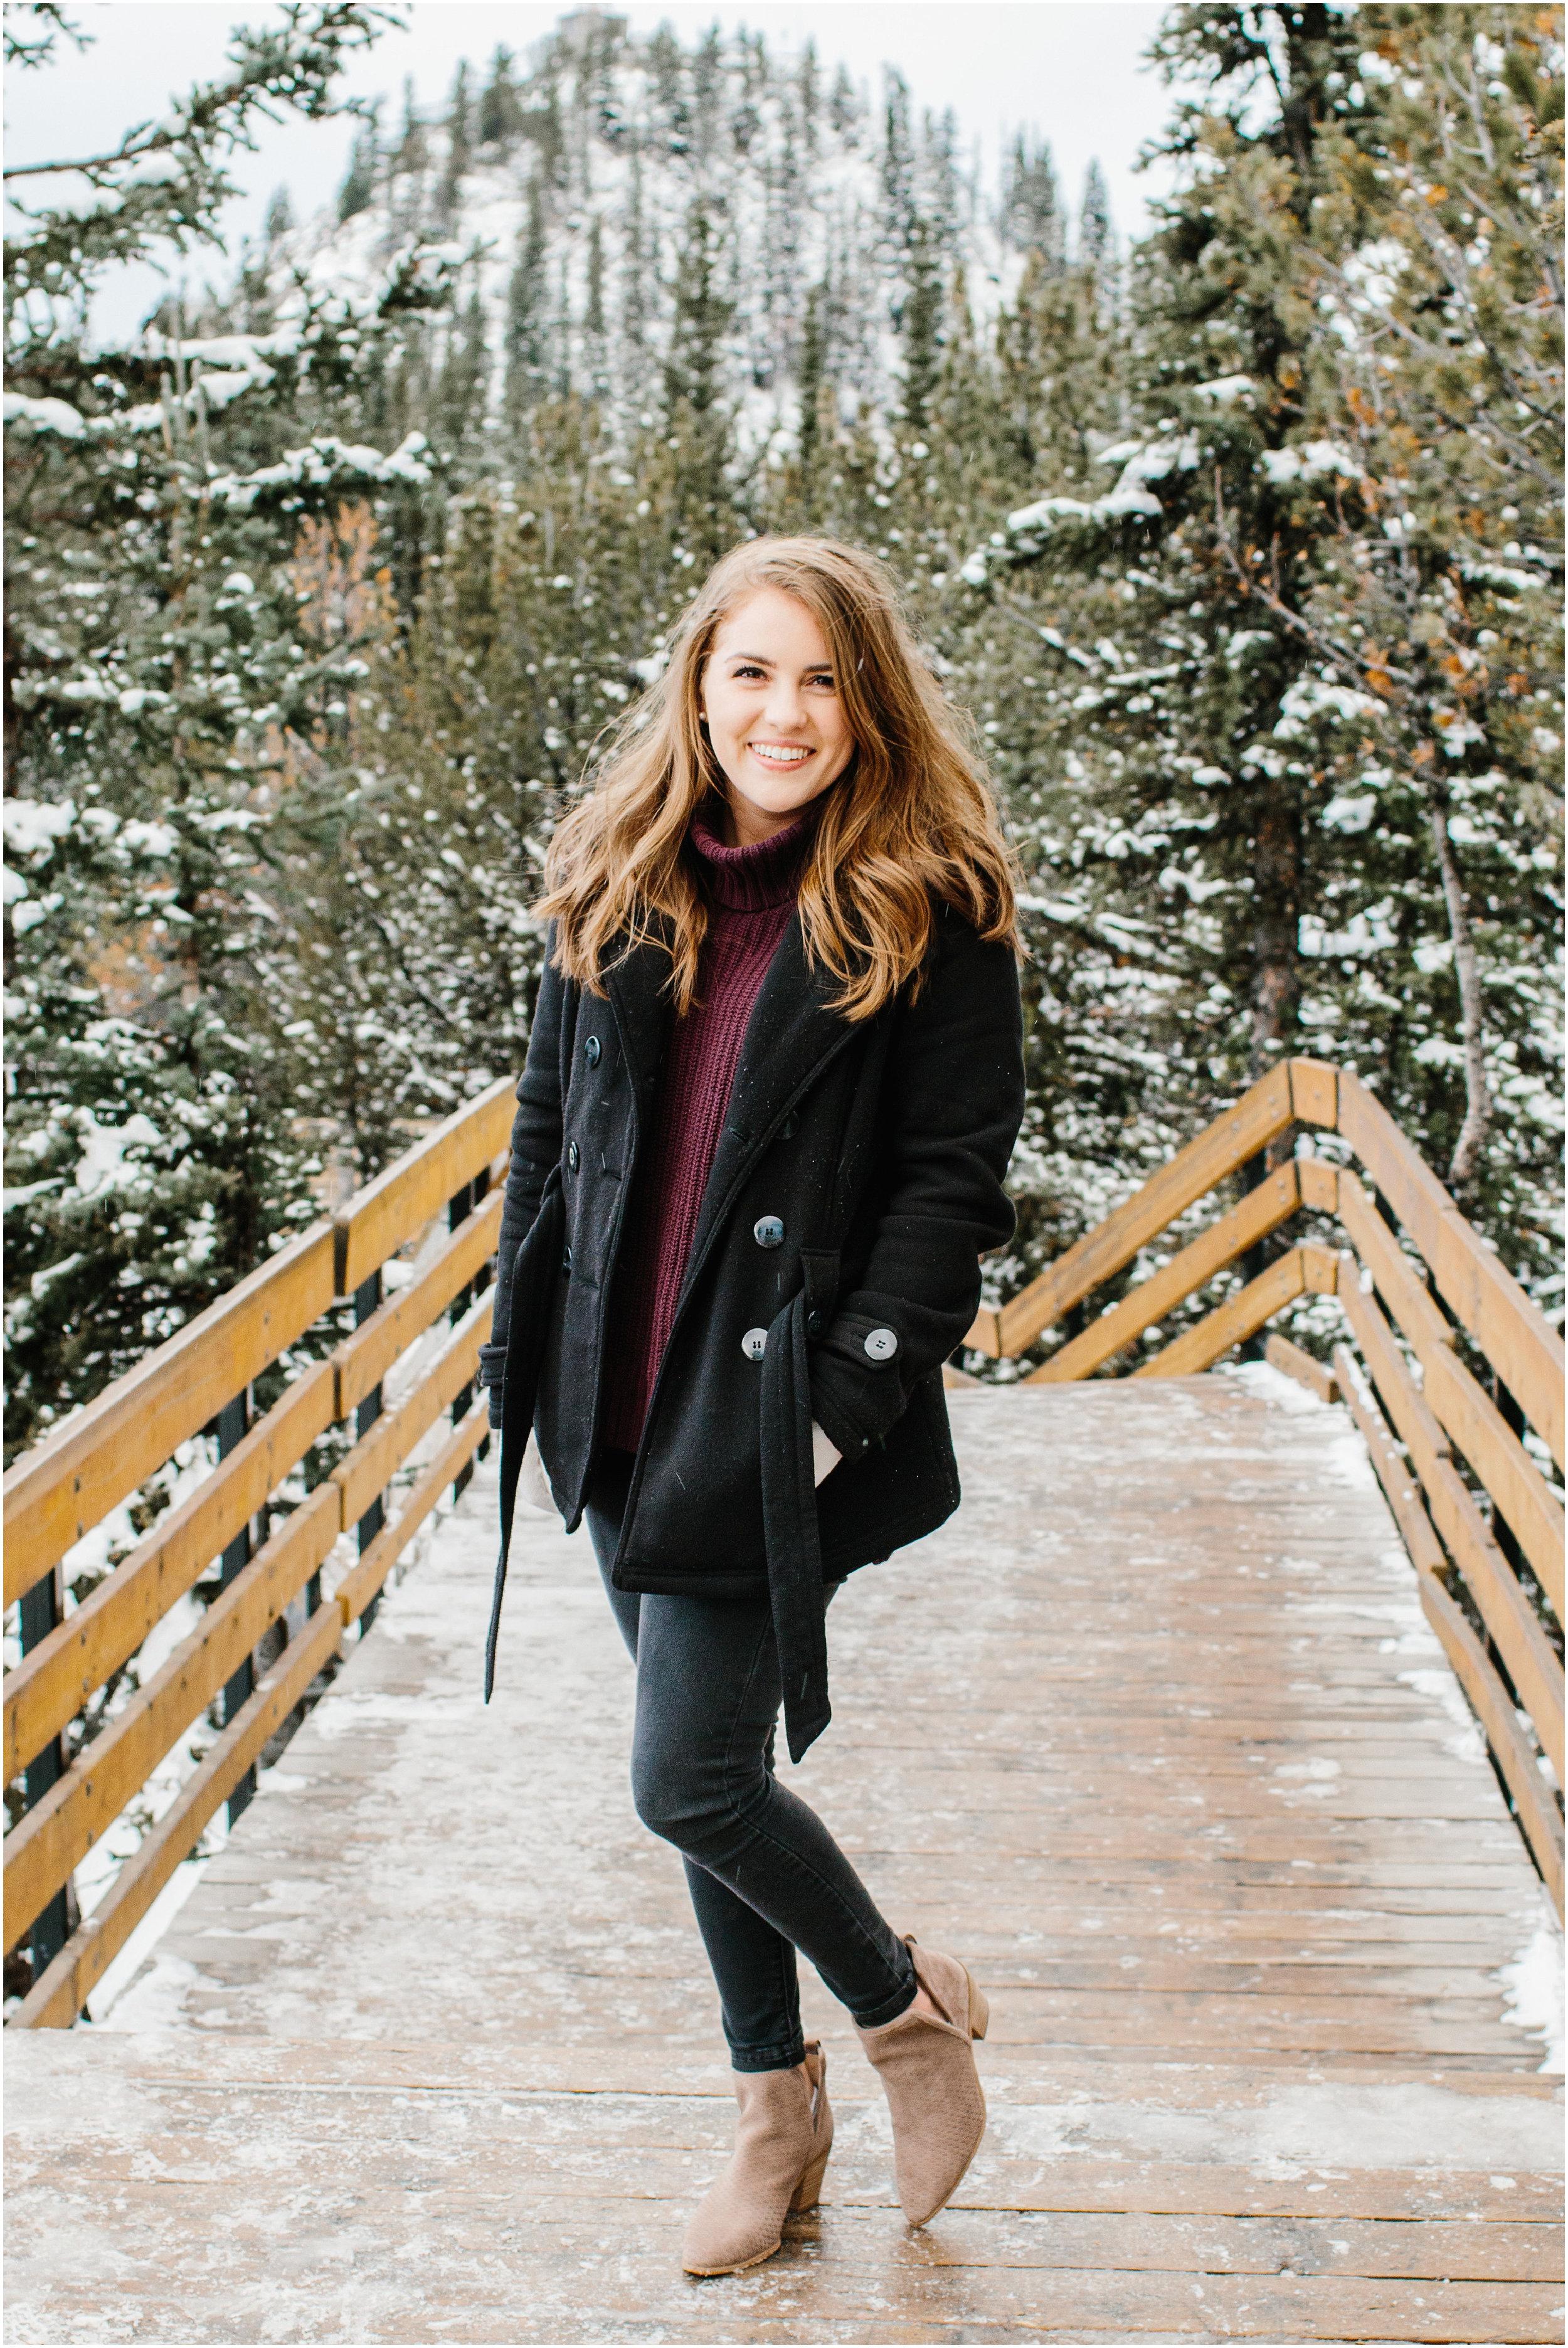 Banff_Travel_Photographer-38.jpg